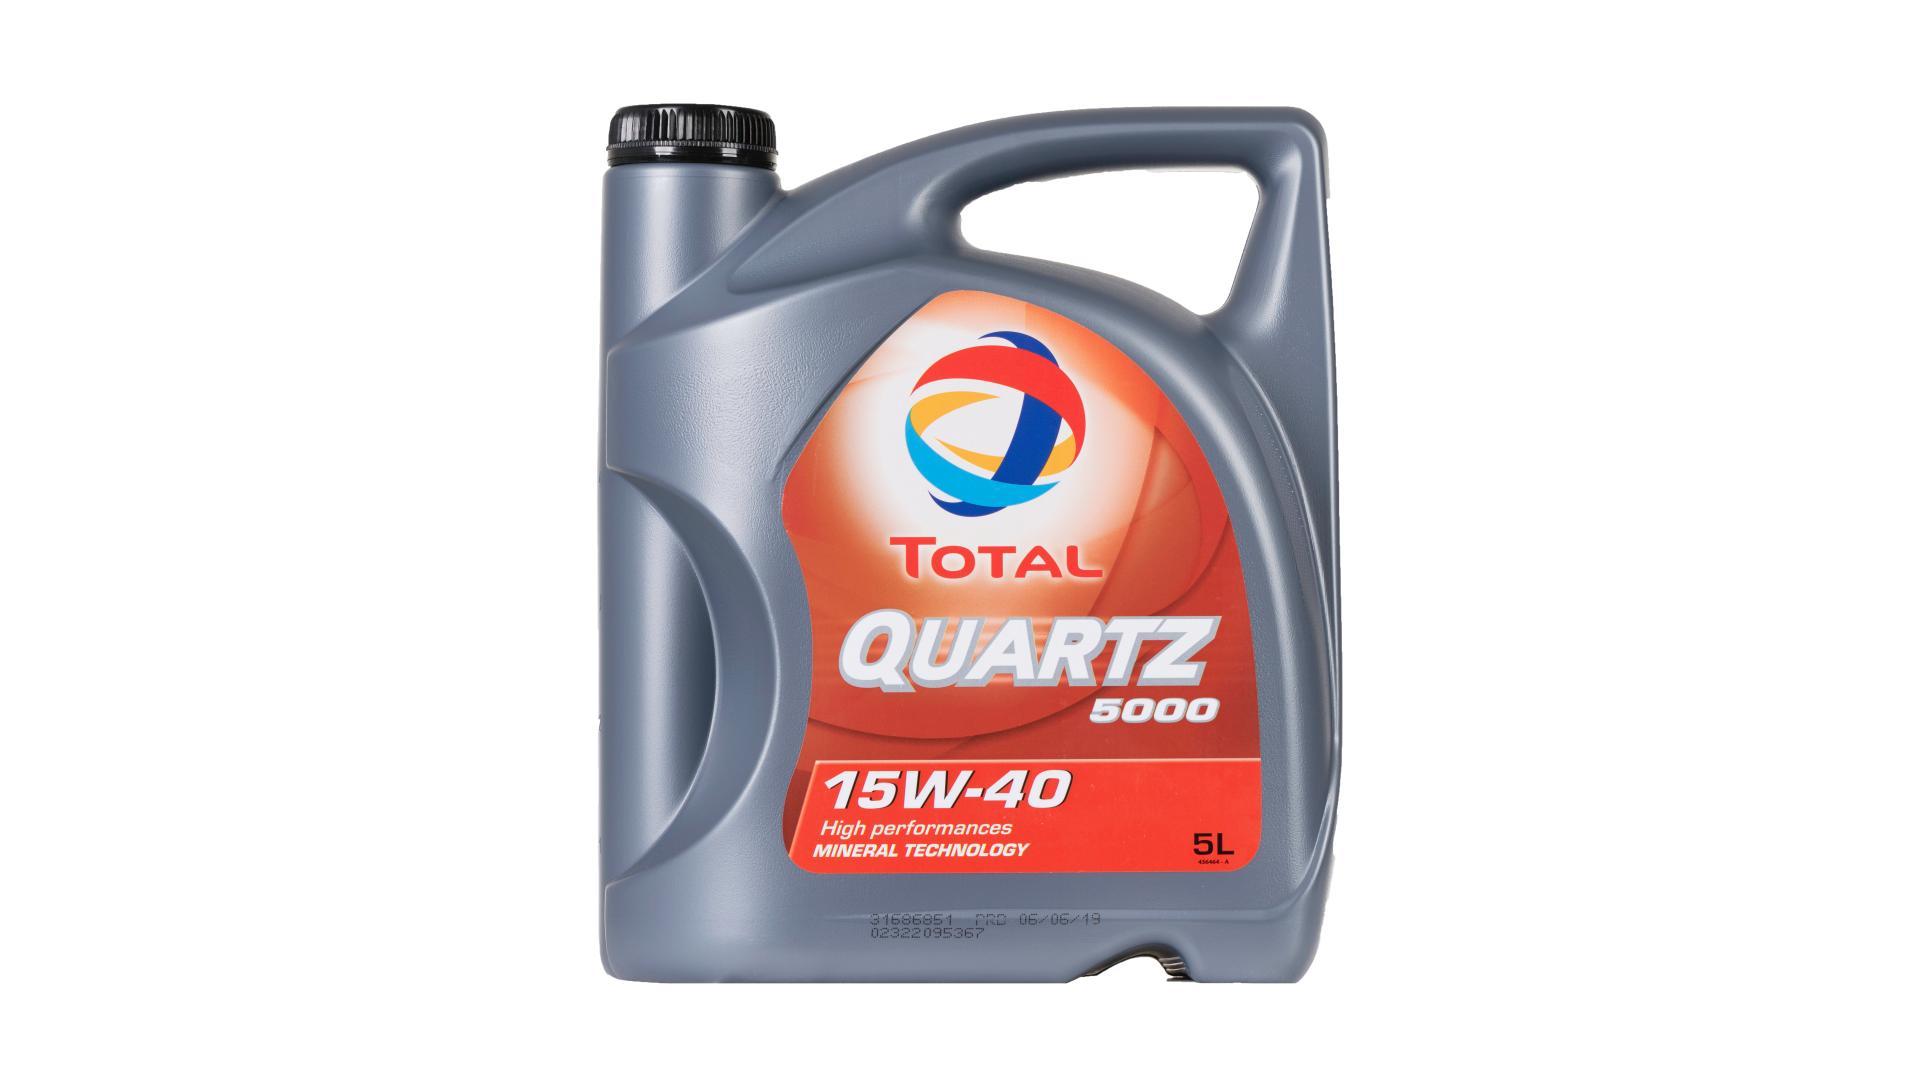 Total 15w-40 Quartz 5000 5L (148645)